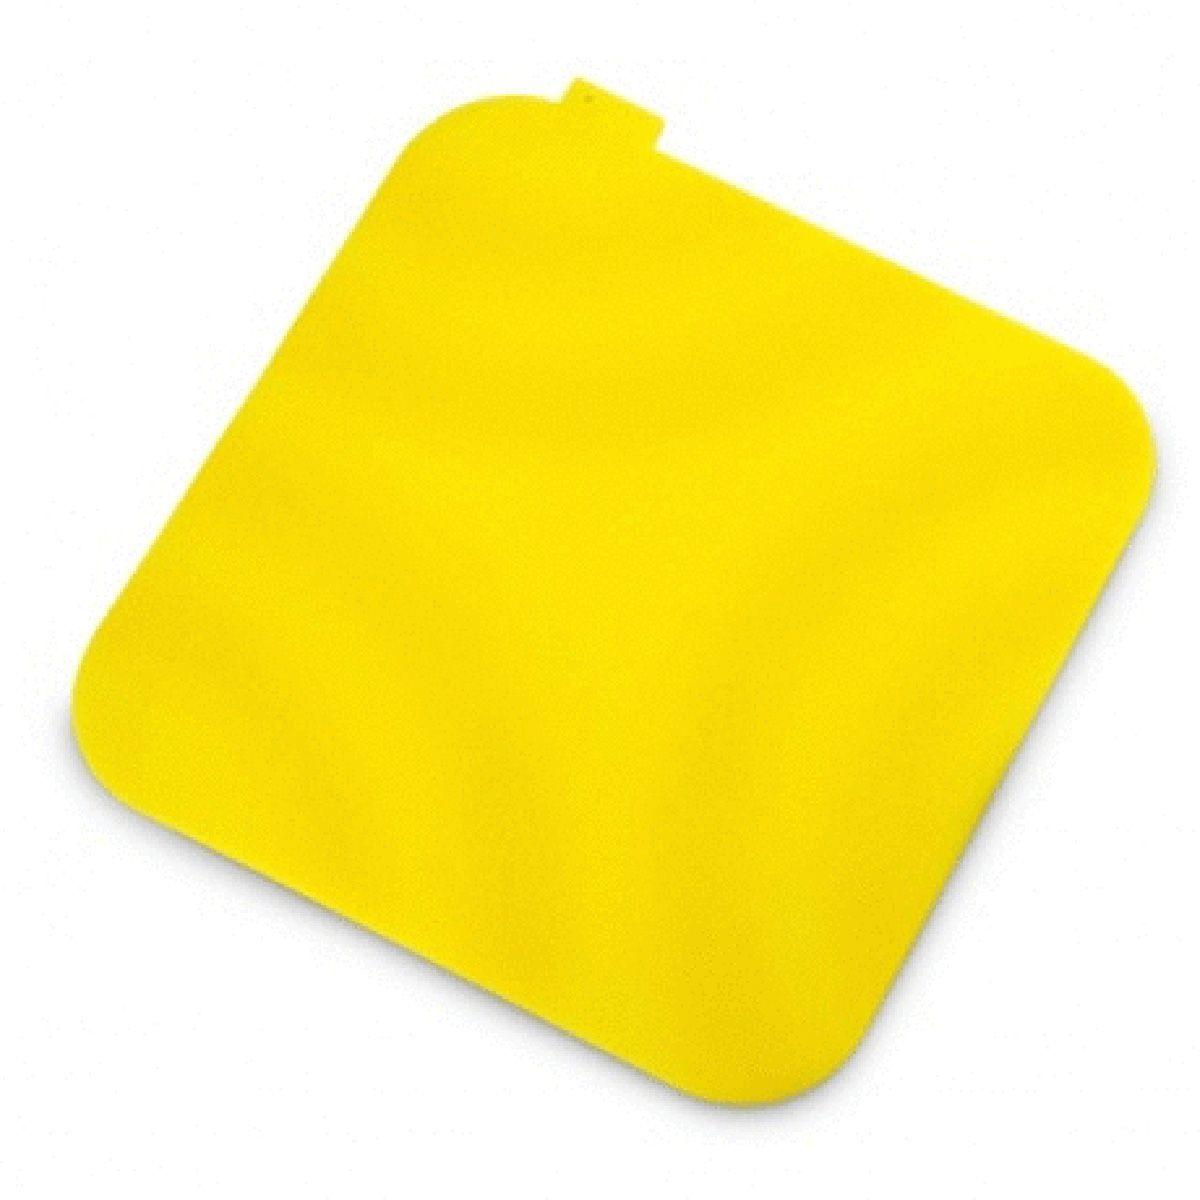 Подставка под горячее MoulinVilla, цвет: желтый, SIL-1SIL-1YПодставка под горячее силикон желтая